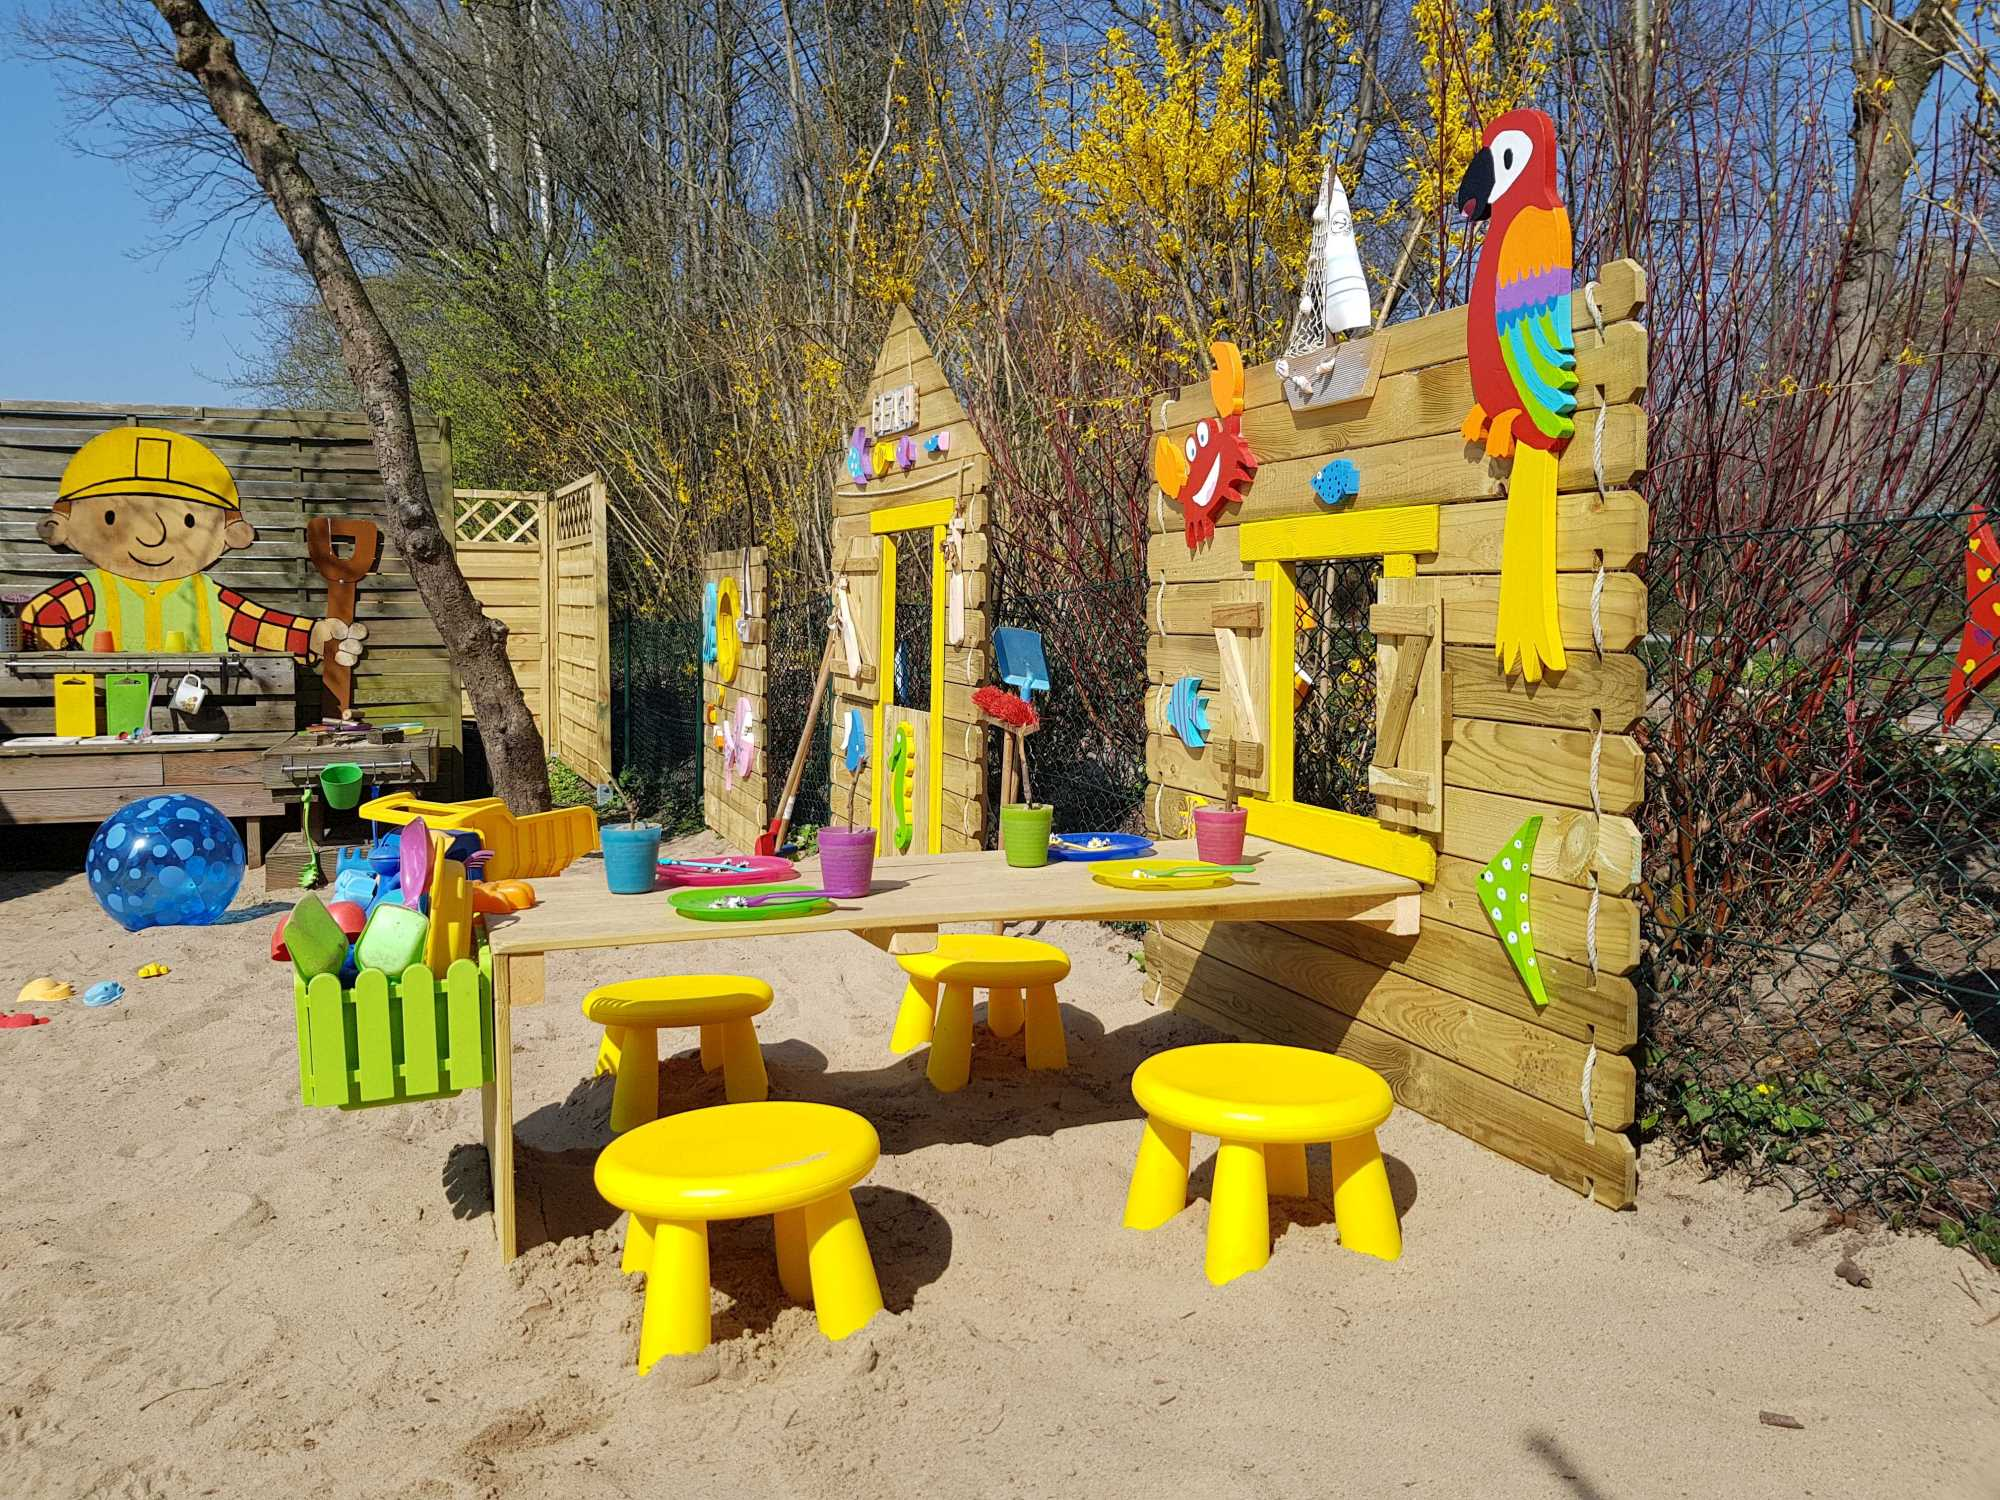 Kita Kid Zone Kinderbetreuung Garten1 14 - Kinder-Beachclub